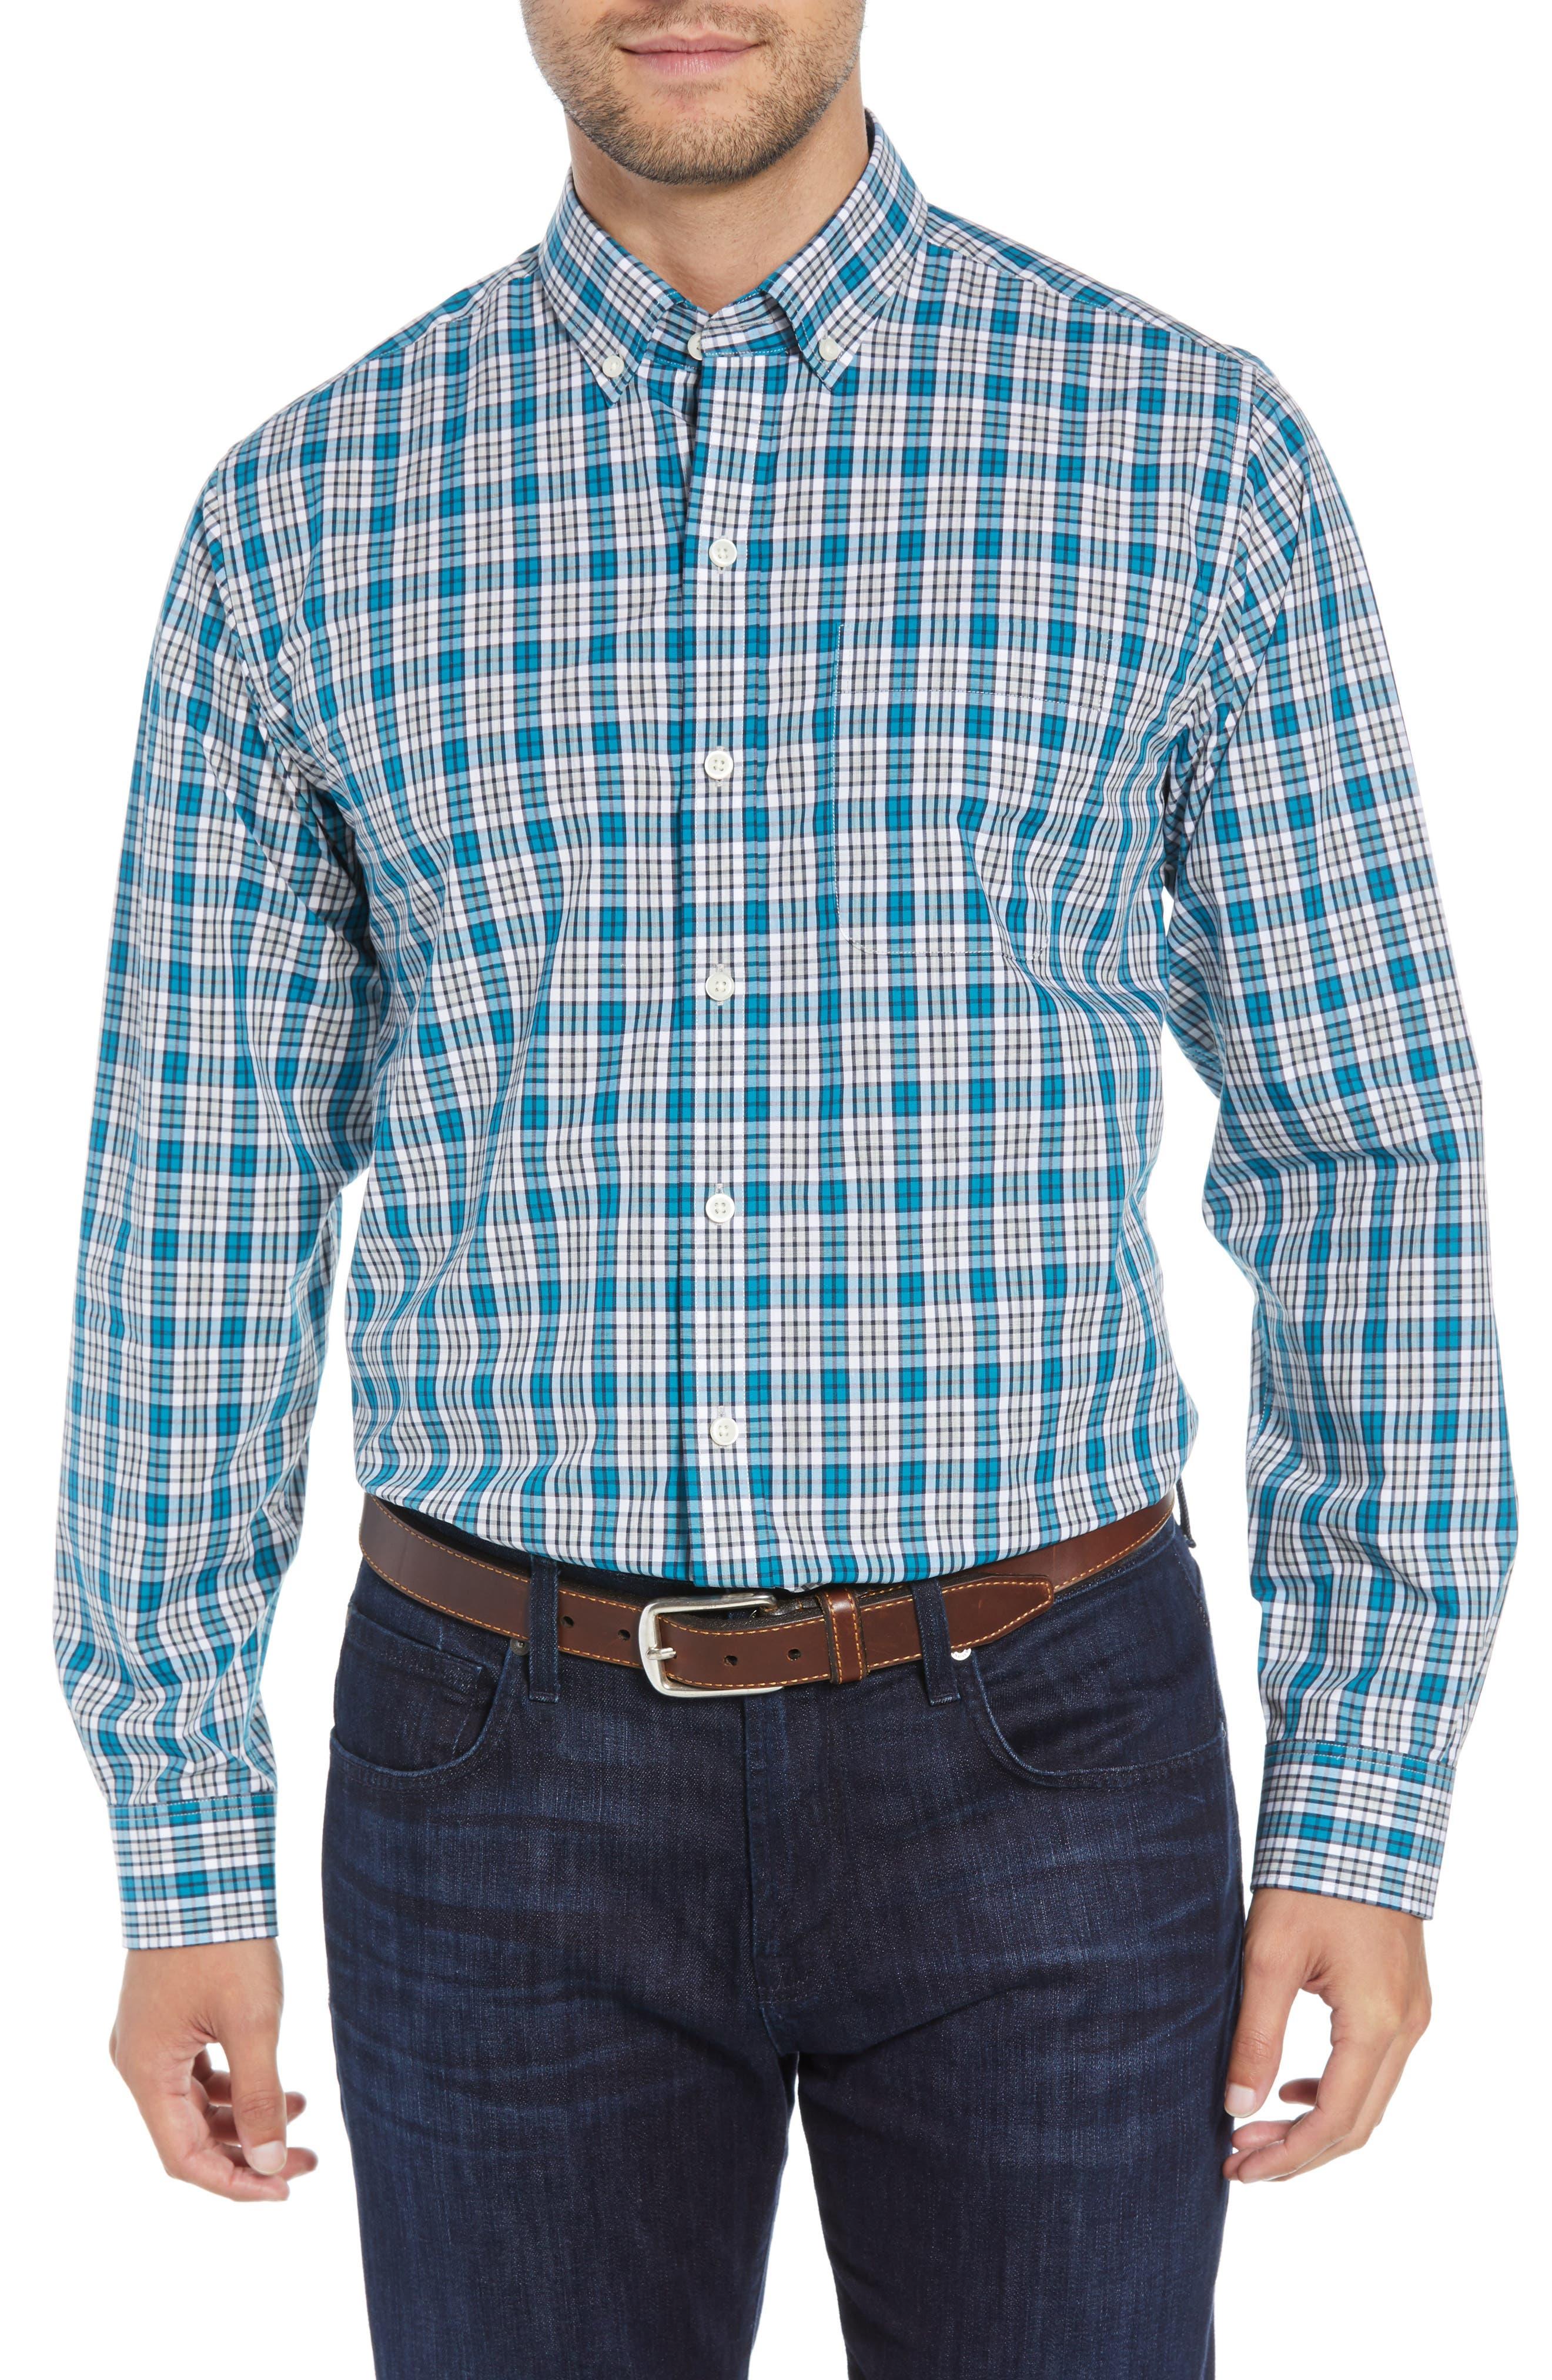 Harris Regular Fit Non-Iron Plaid Sport Shirt,                             Main thumbnail 1, color,                             AQUATIC